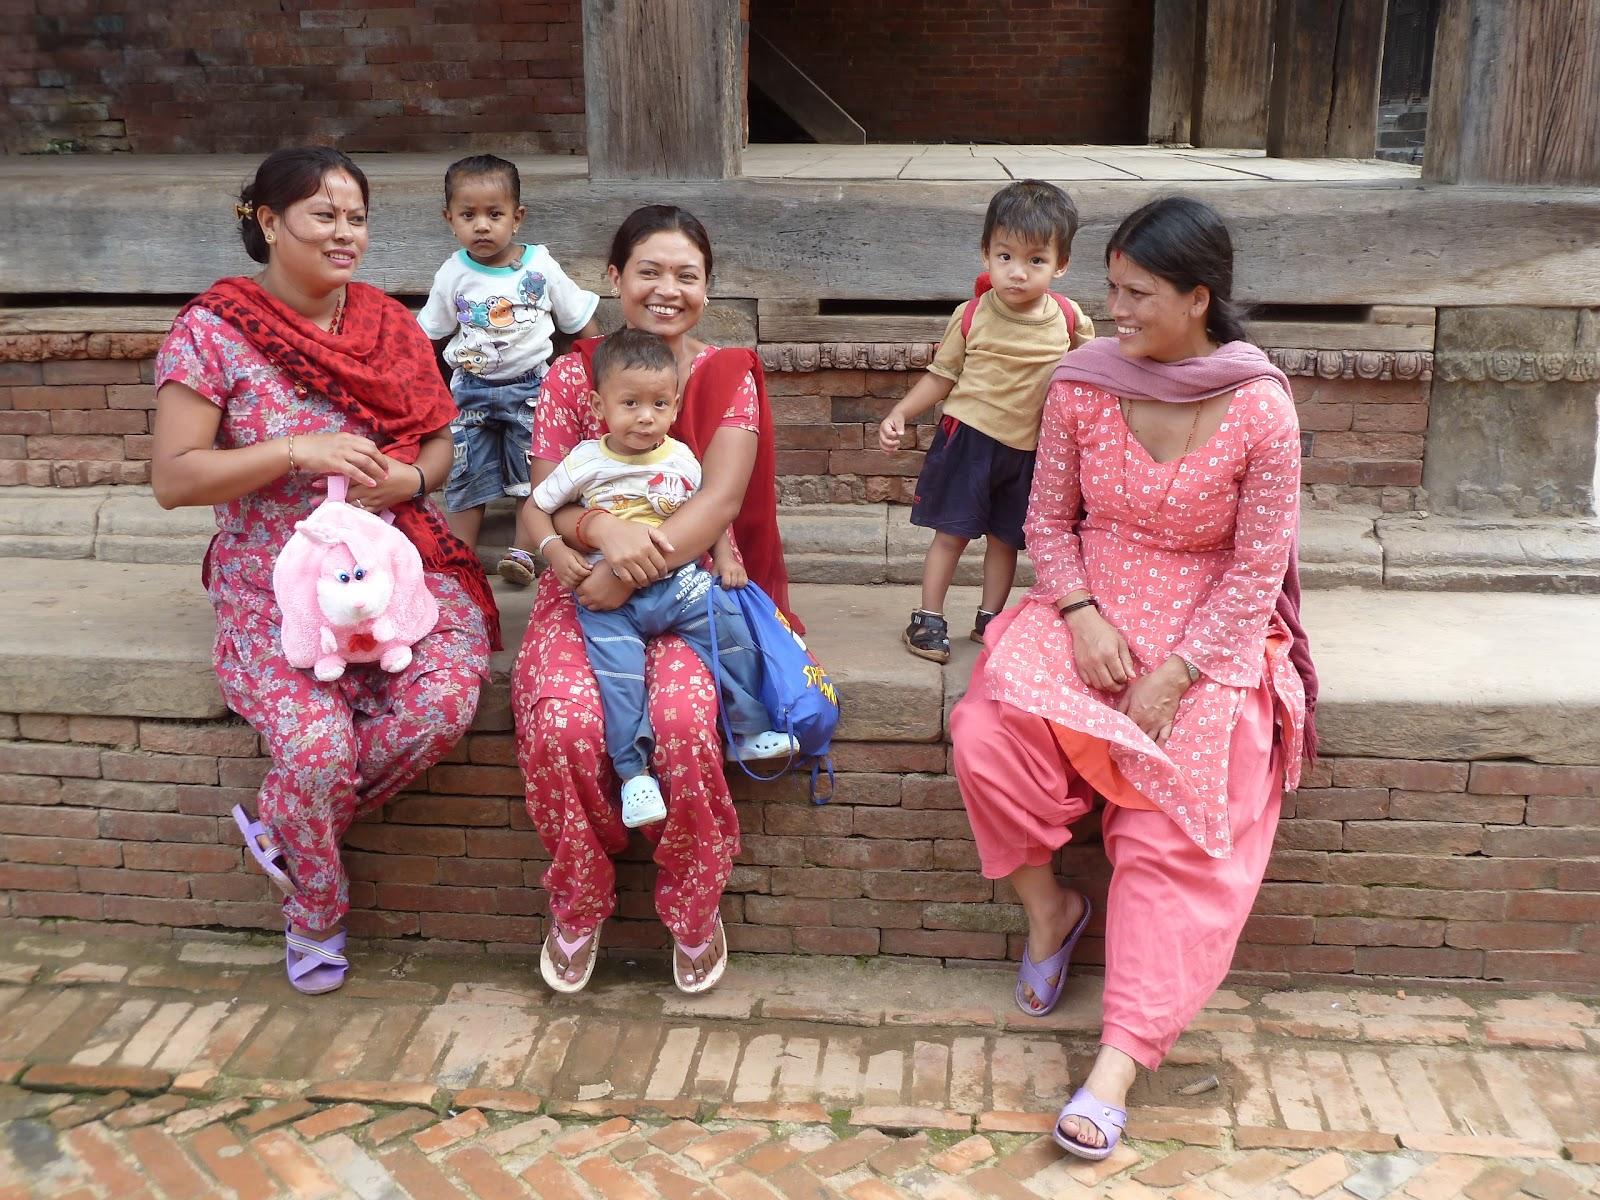 Welsh Davids Travel Blog July People Of Kathmandu Nepal